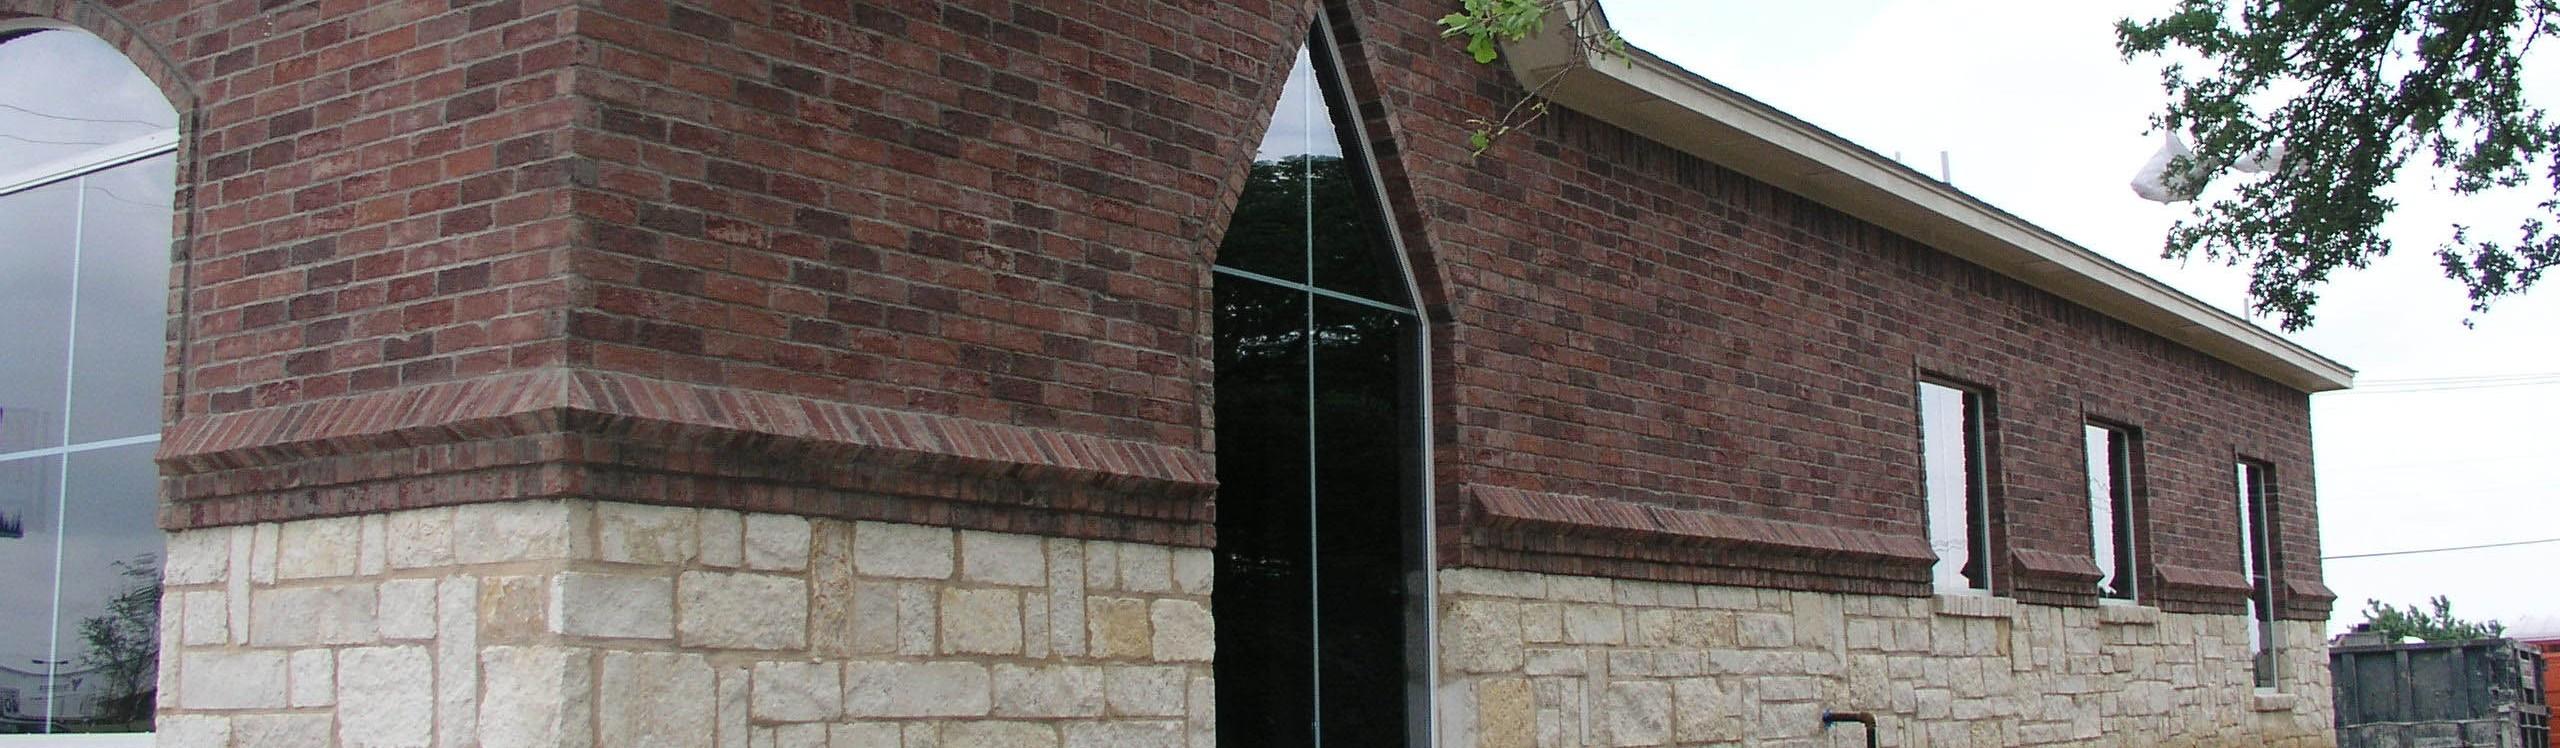 Dr Glen Boyd Doctors Office Construction Exterior Side Window